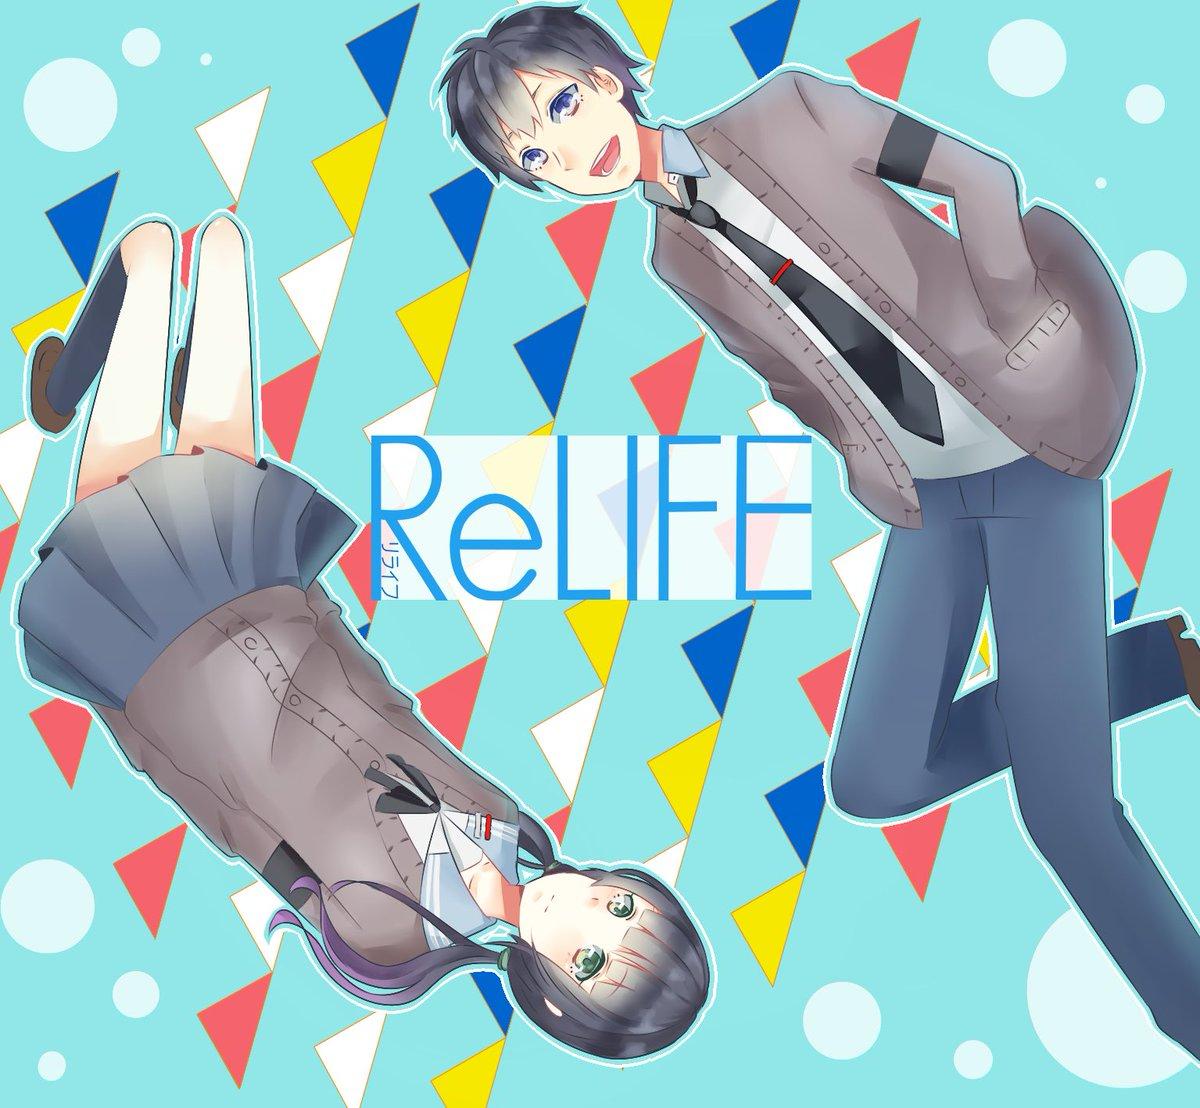 ReLIFE映画化おめでとうございます! #ReLIFE映画化記念